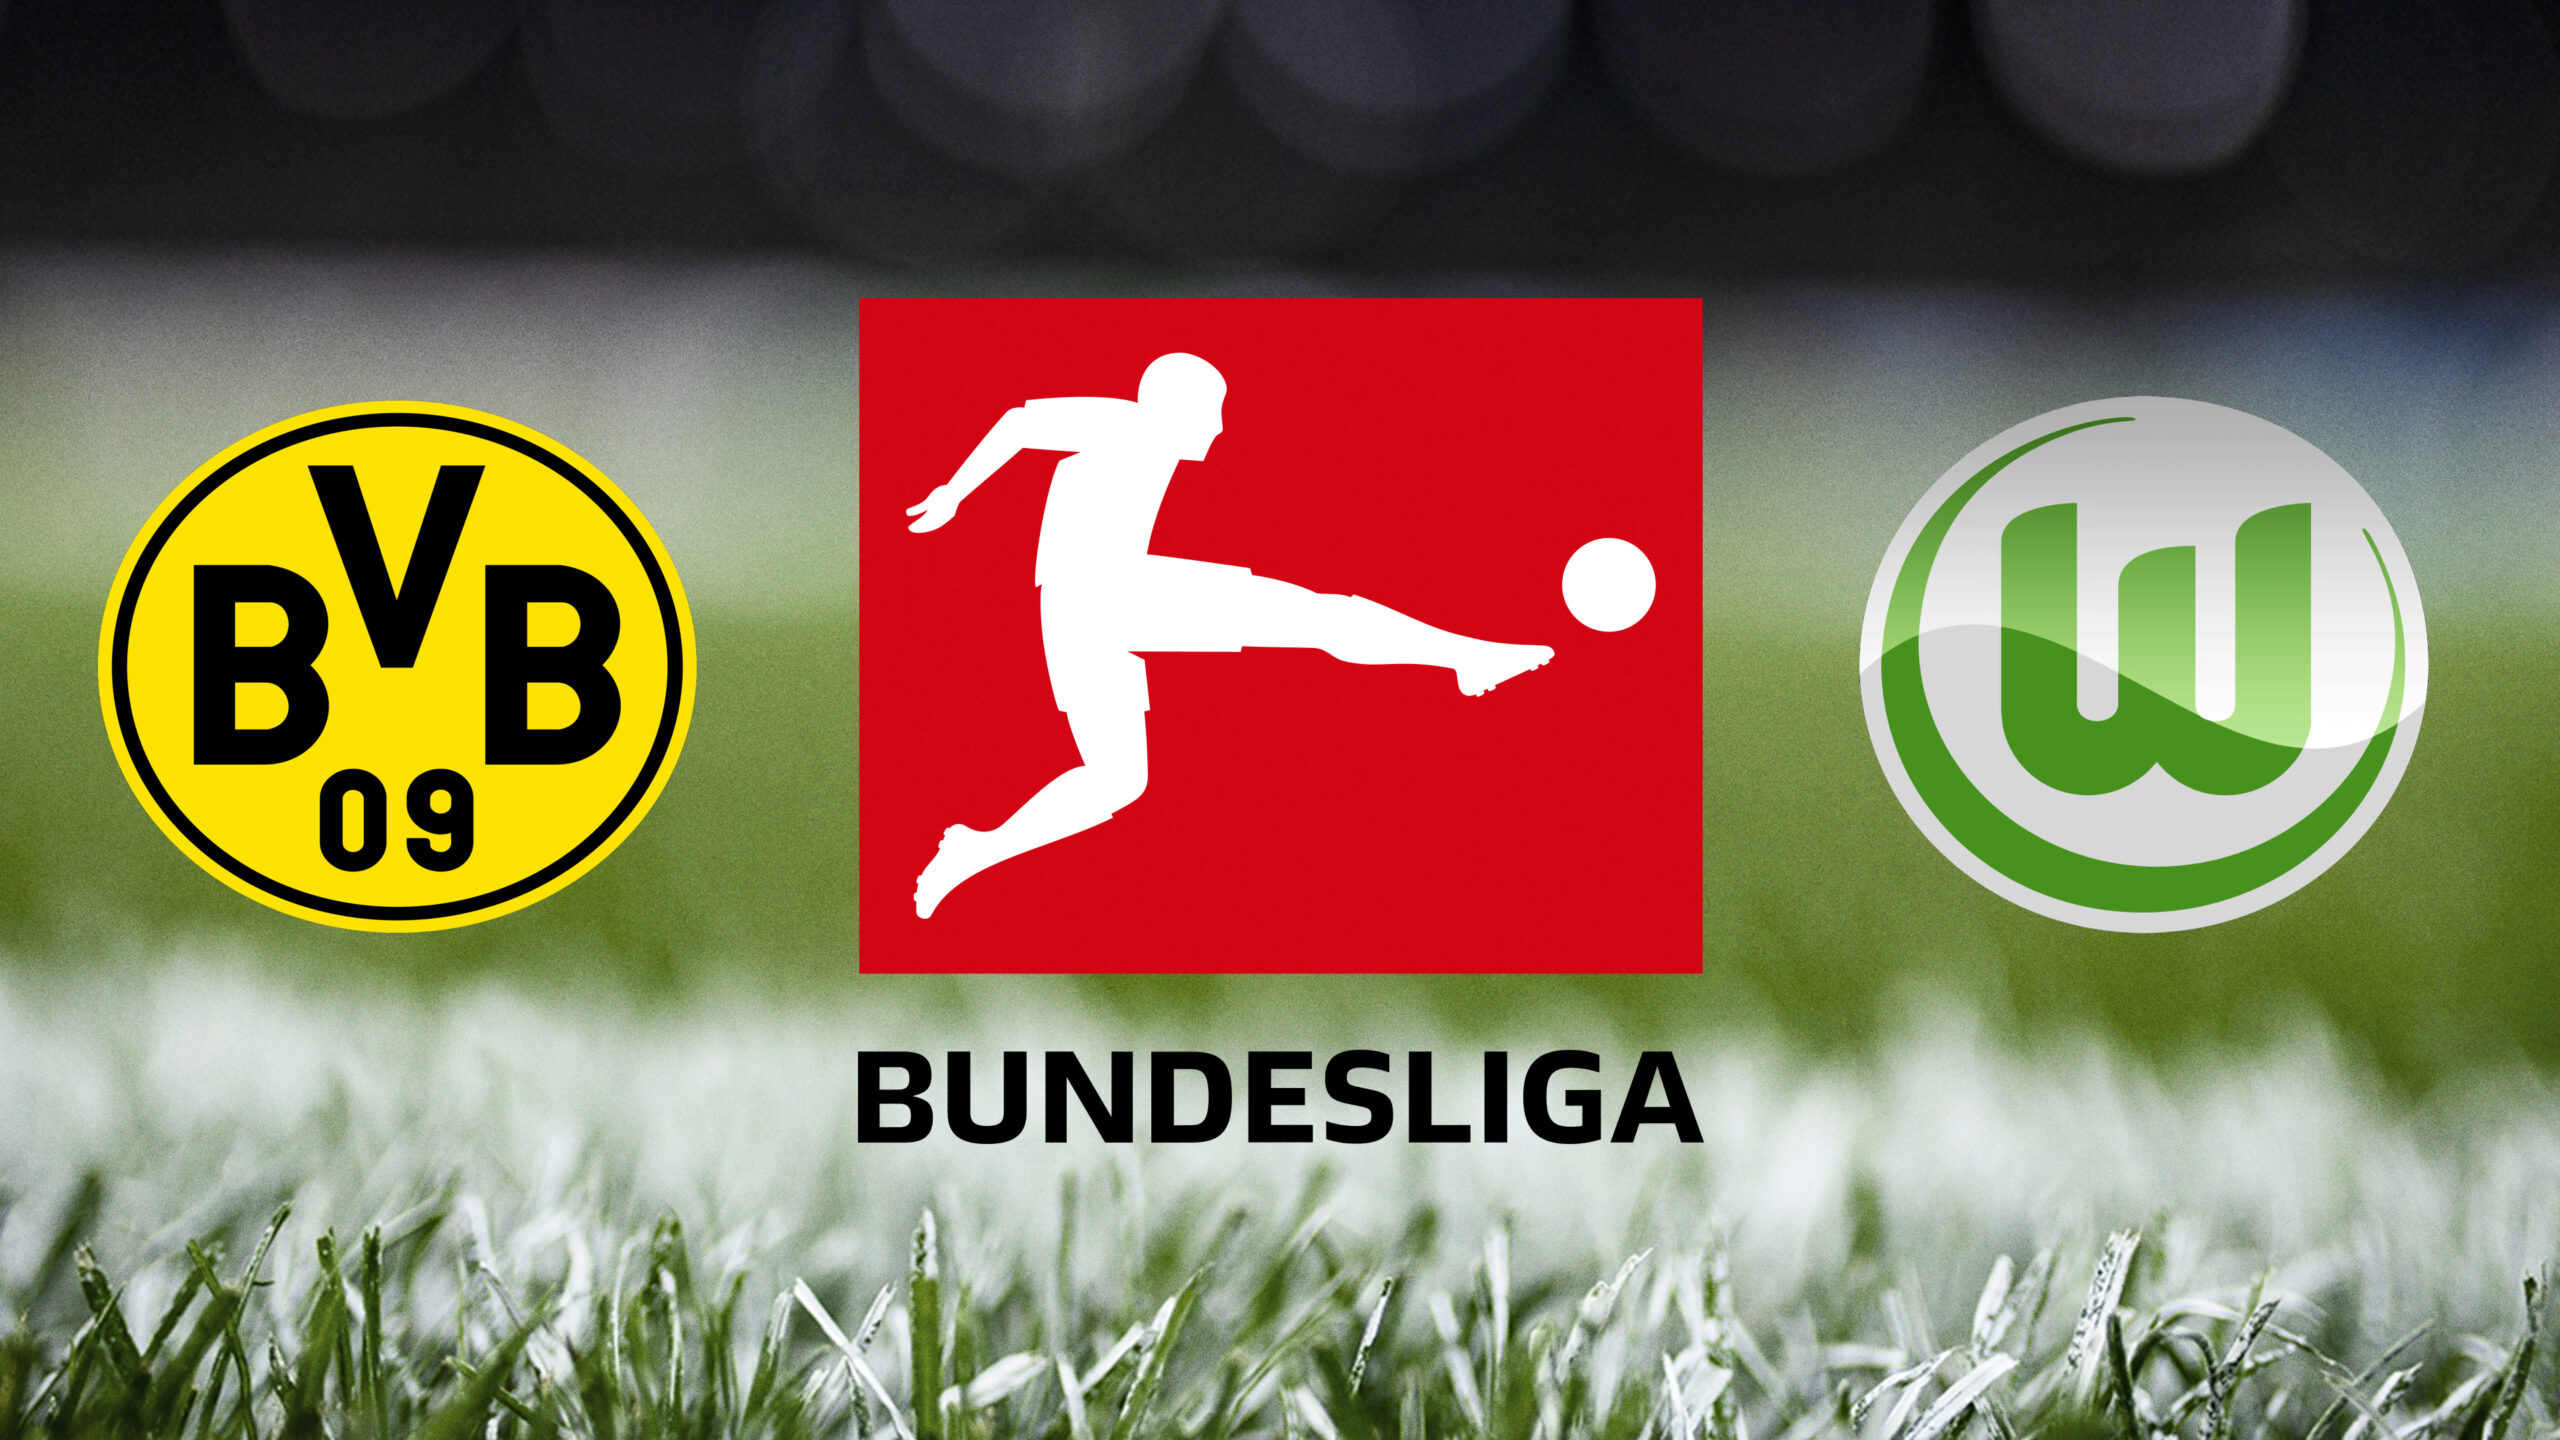 Прогноз на матч Боруссия М - Вольфсбург